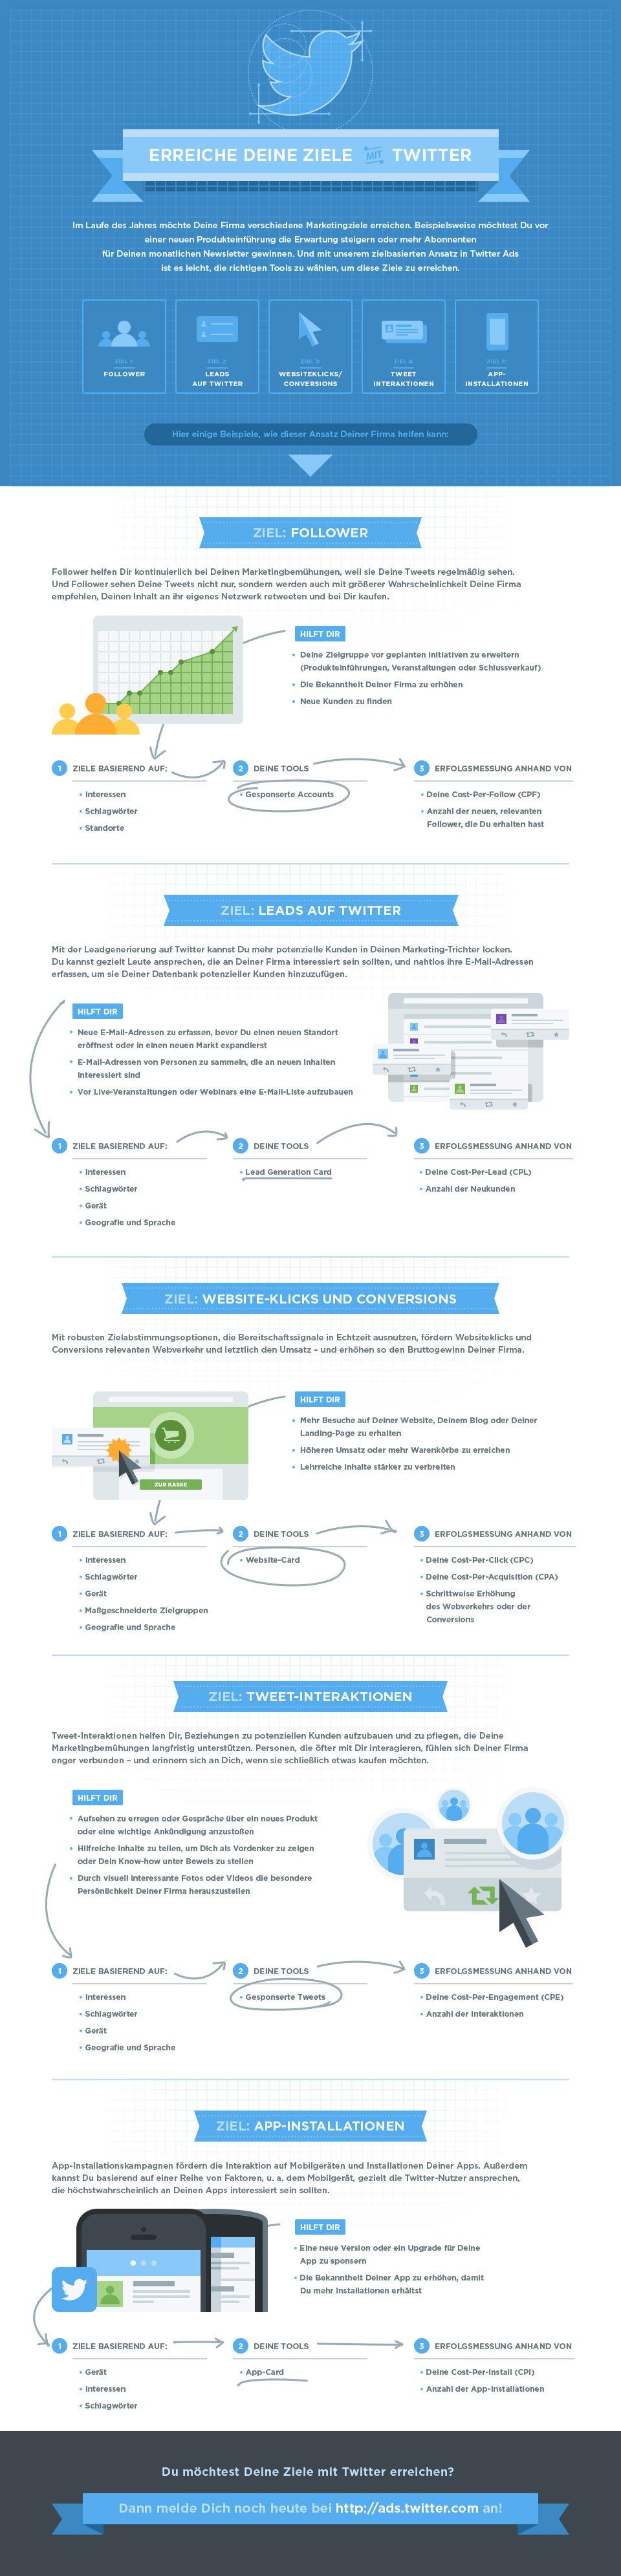 Twitter Ads Infografik